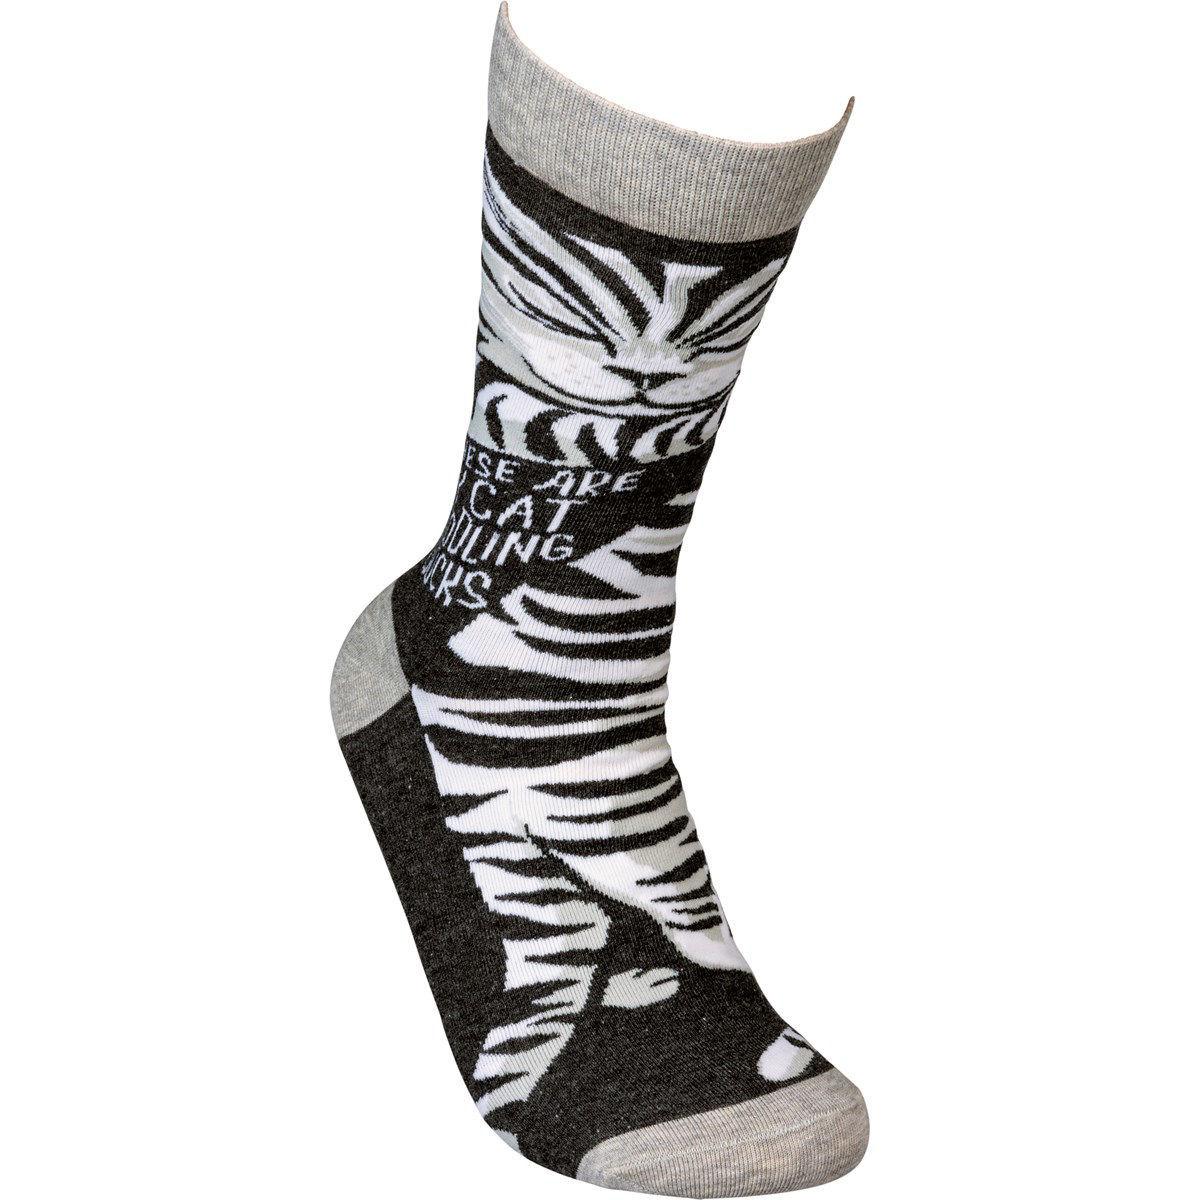 Cat Cuddling Socks by Primitives by Kathy